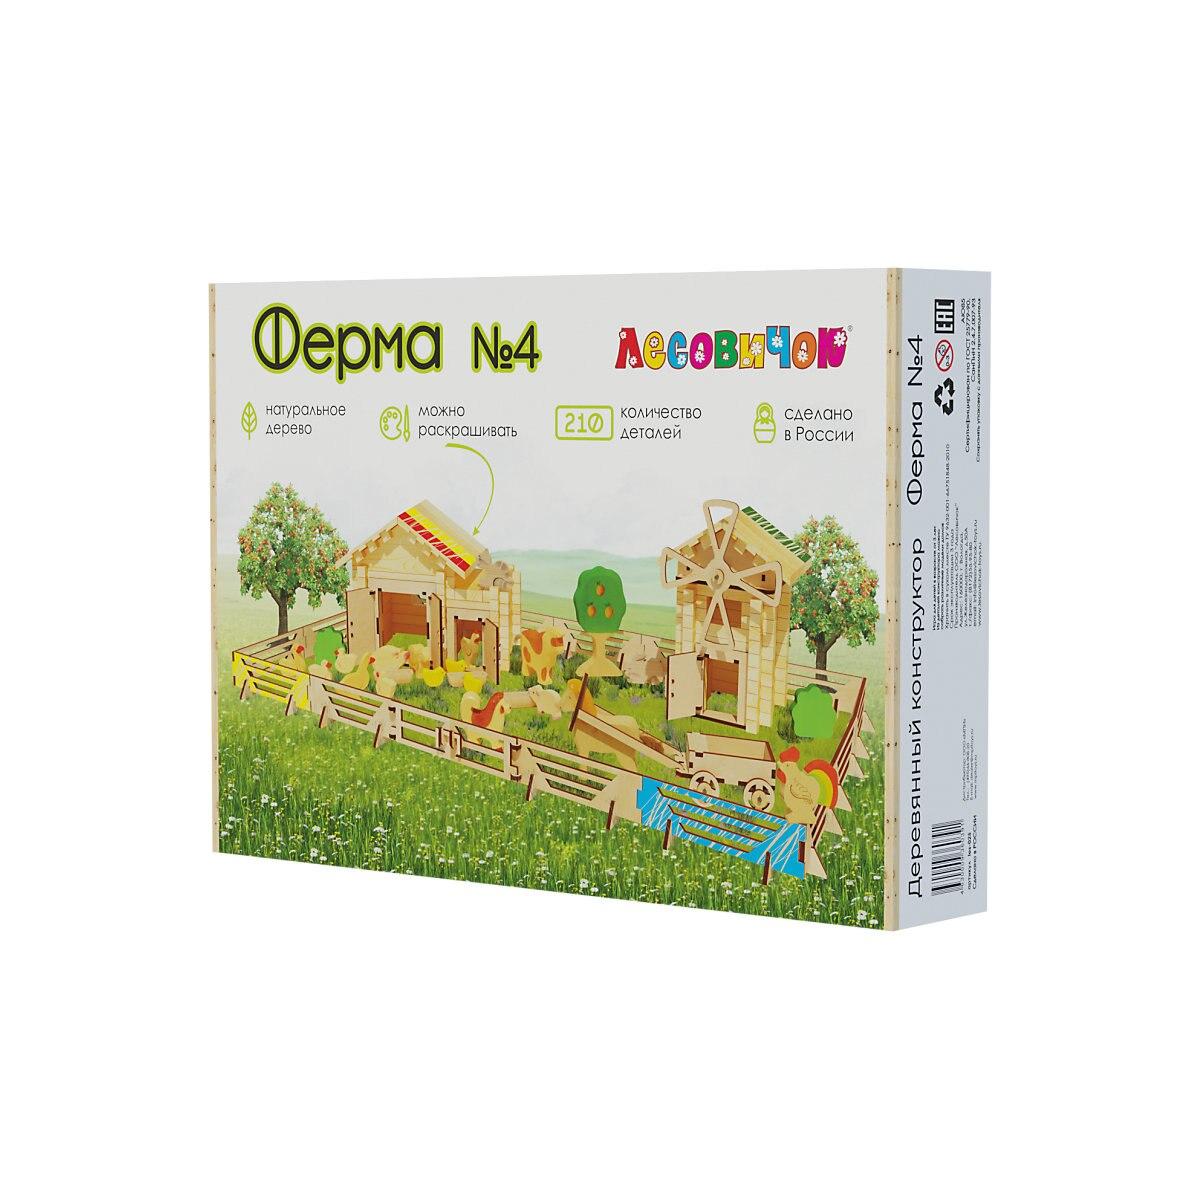 LESOVICHOK Wooden Blocks 10930990 education toys constructor cubes toy lesovichok wooden blocks 10986114 education toys constructor cubes toy